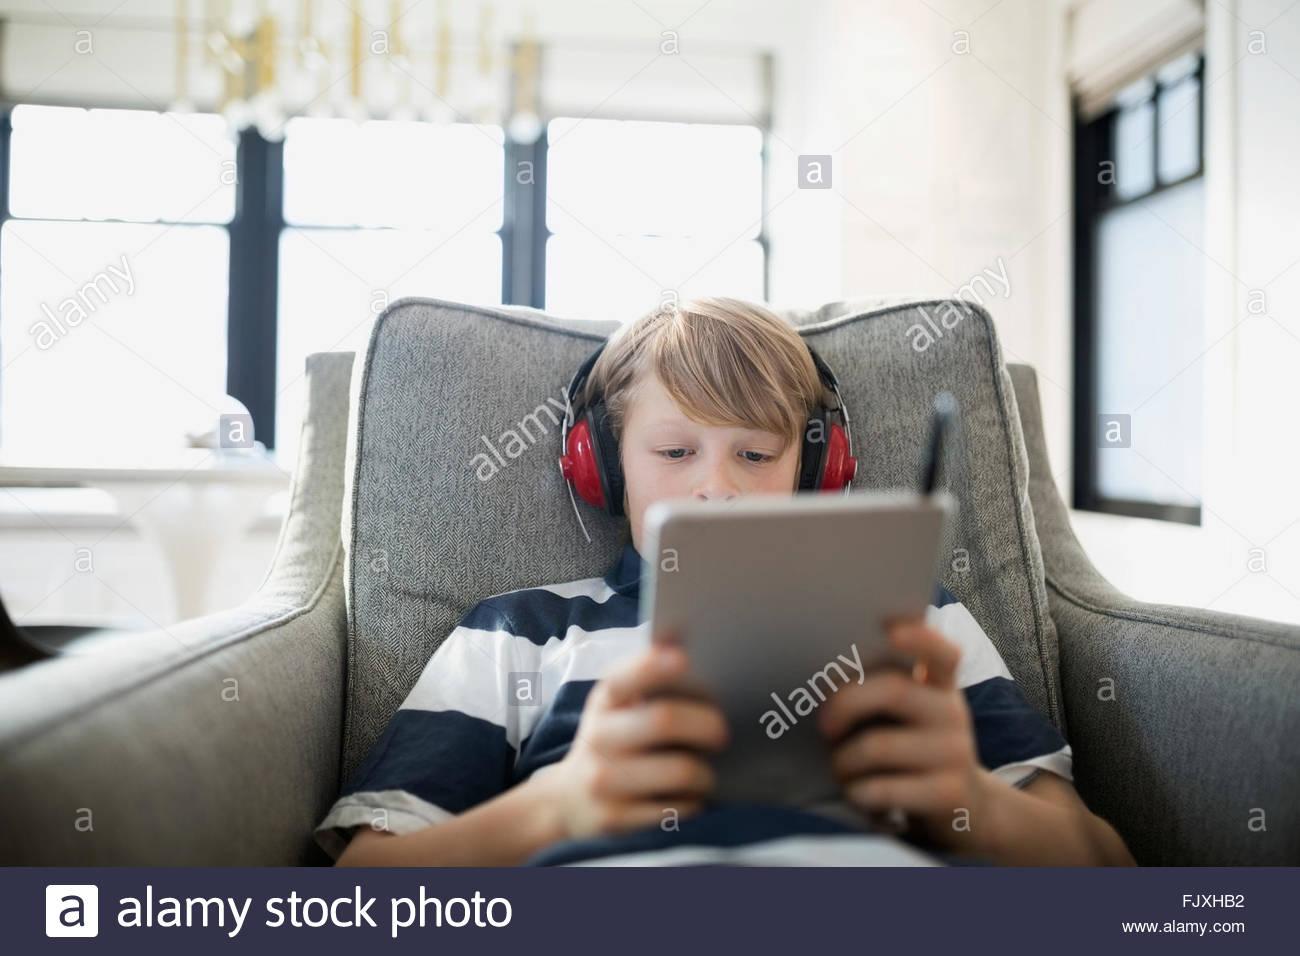 Junge mit Kopfhörer mit digital-Tablette in Sessel Stockbild